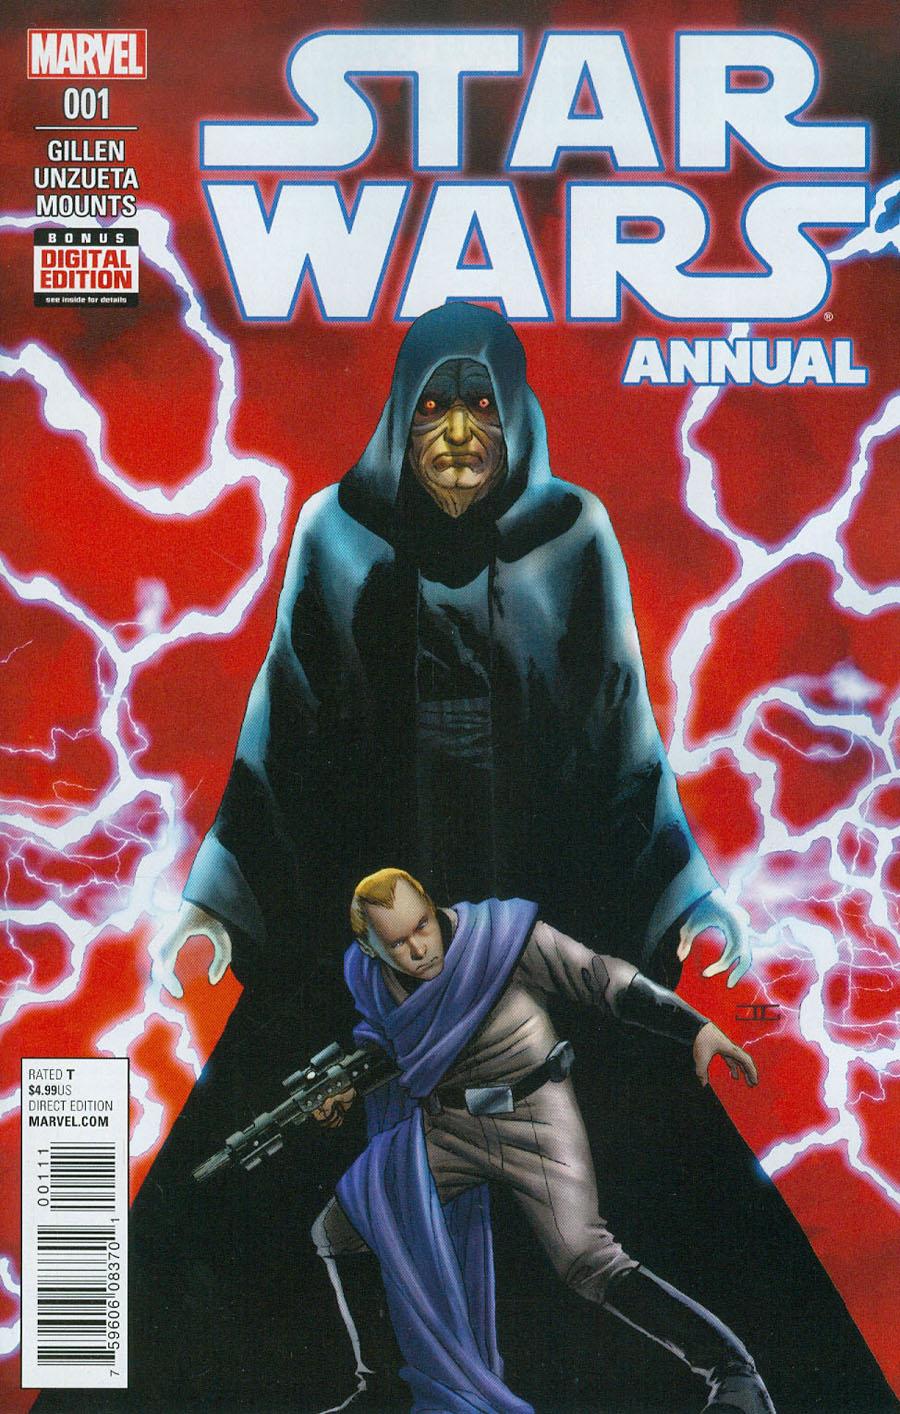 Star Wars Vol 4 Annual #1 Cover A Regular John Cassaday Cover